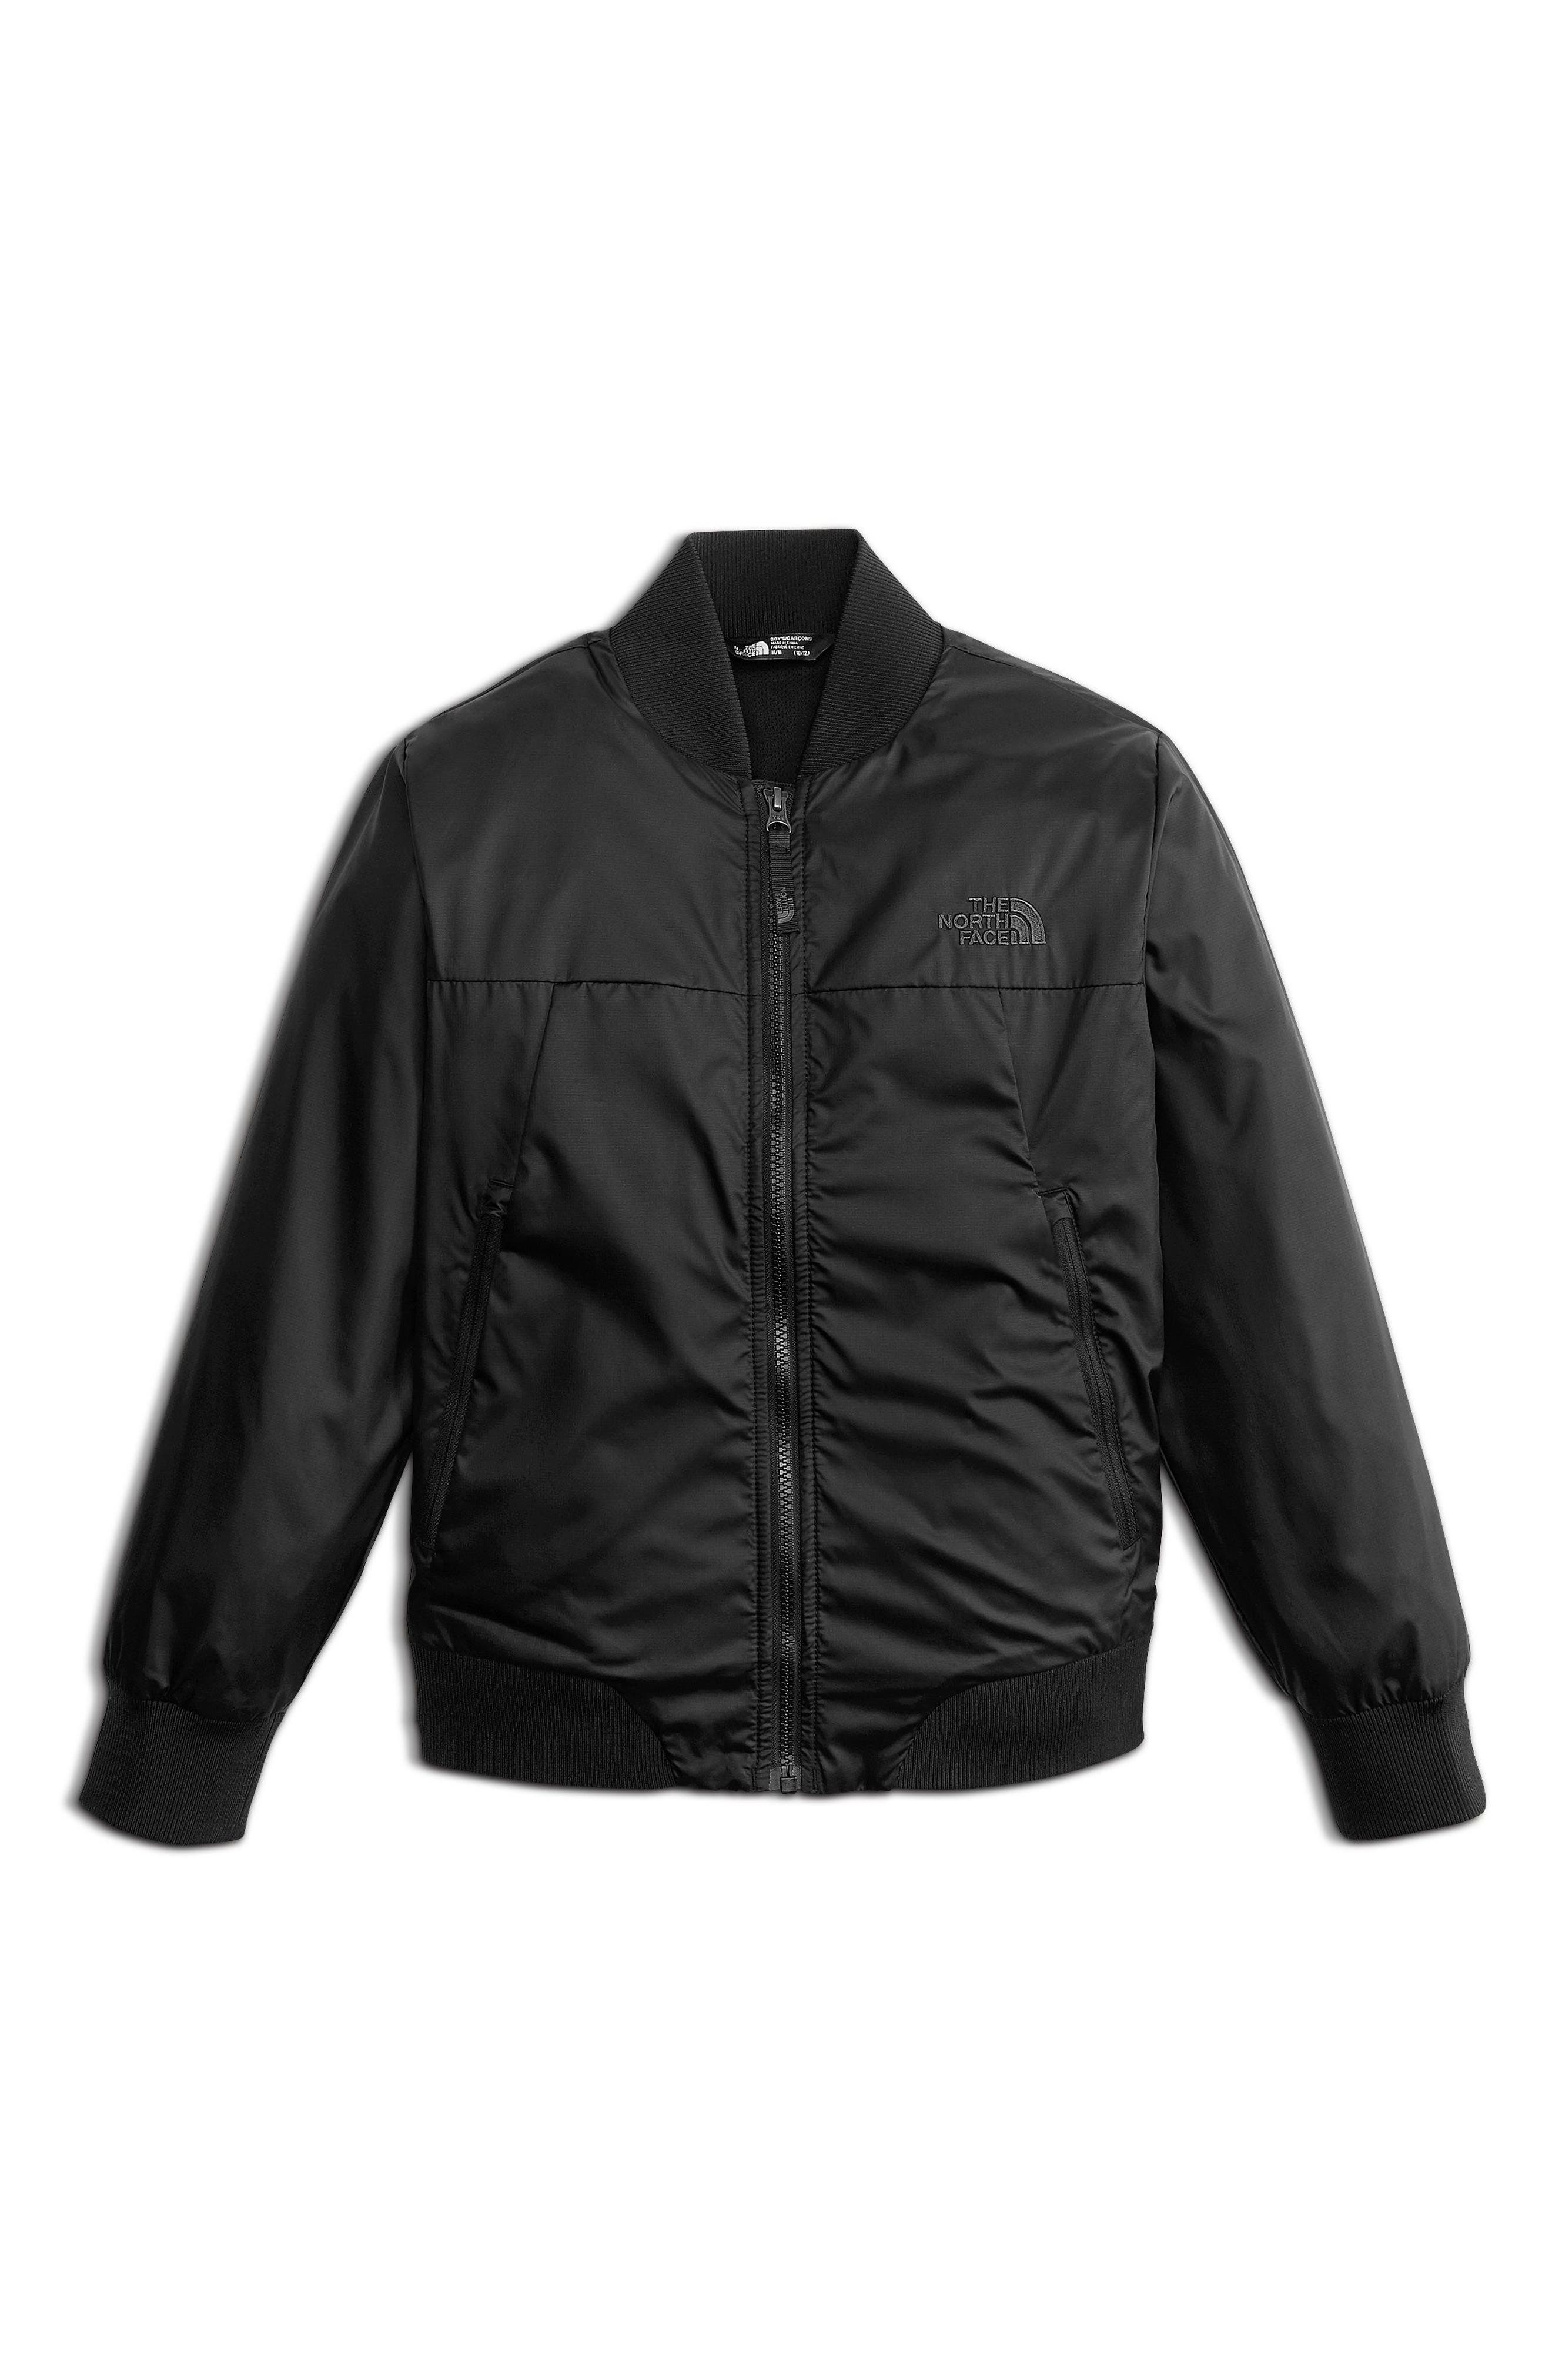 Flurry Windproof Bomber Jacket,                             Main thumbnail 1, color,                             Tnf Black